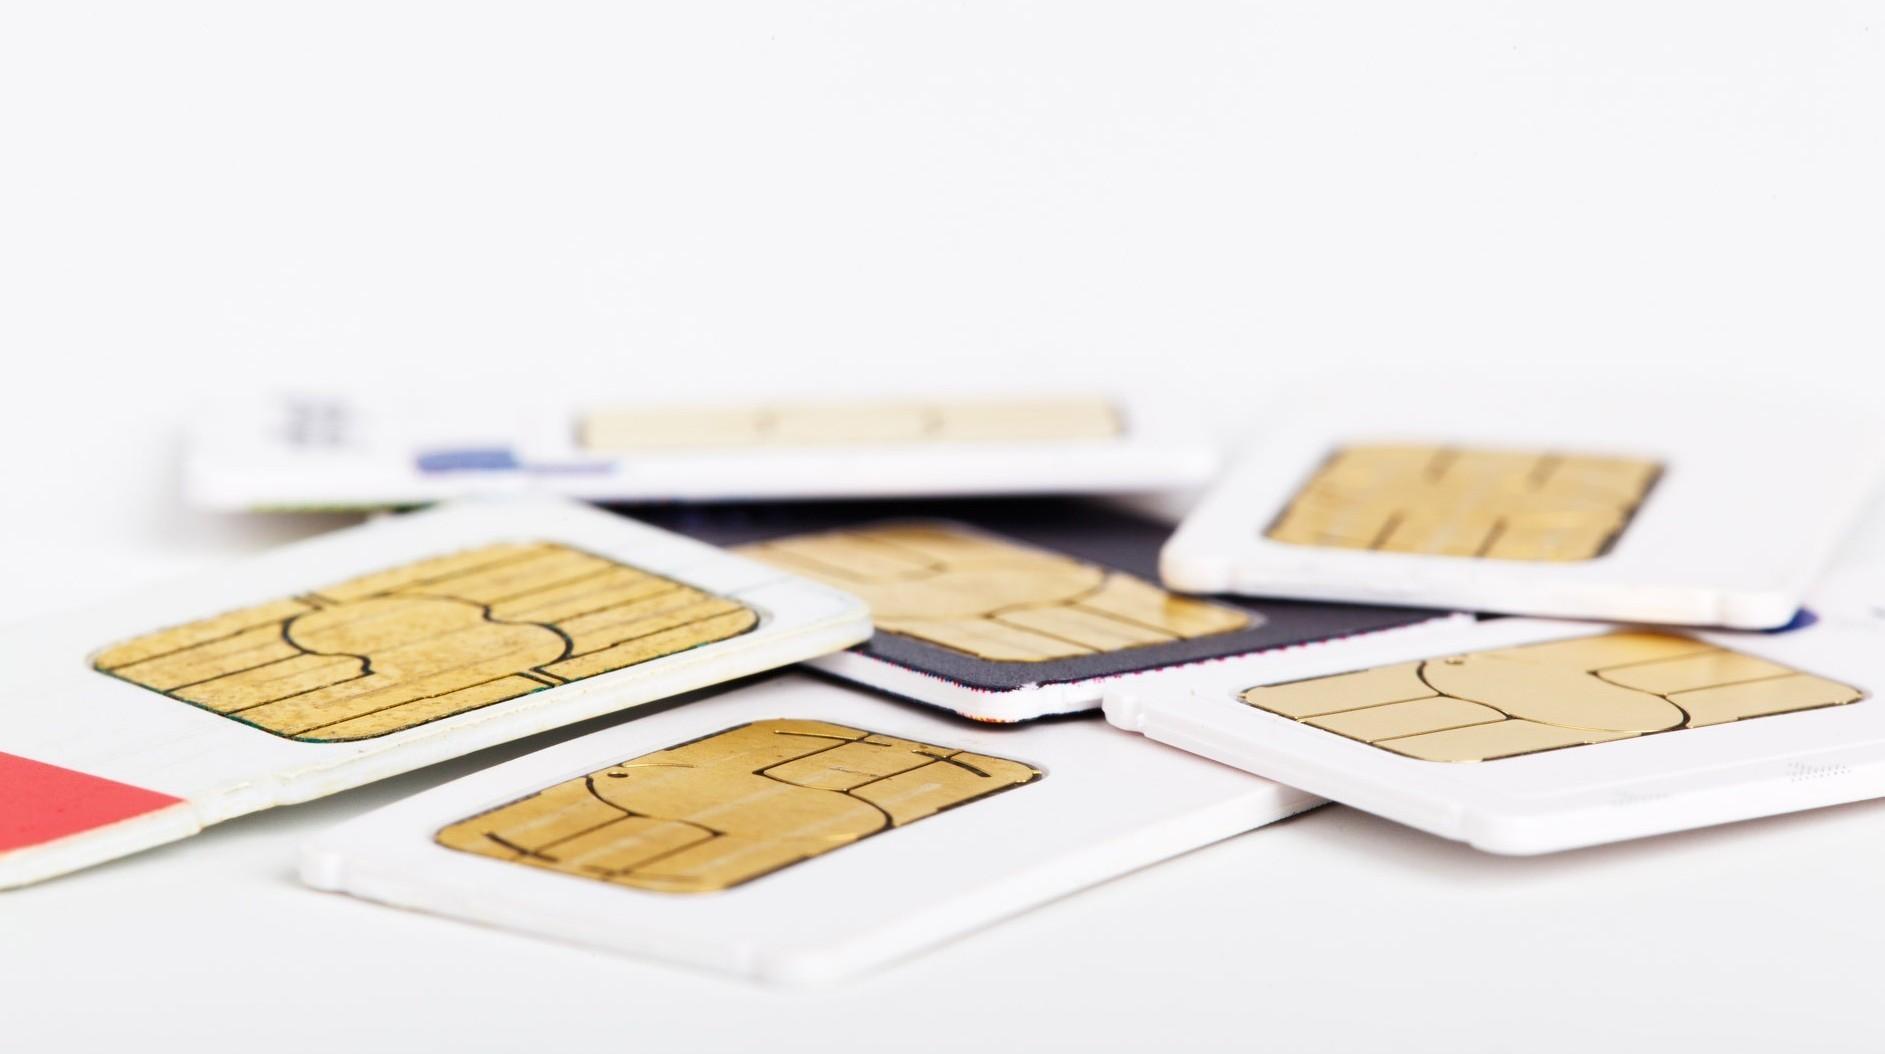 Ondata attacchi contro sim card cellular